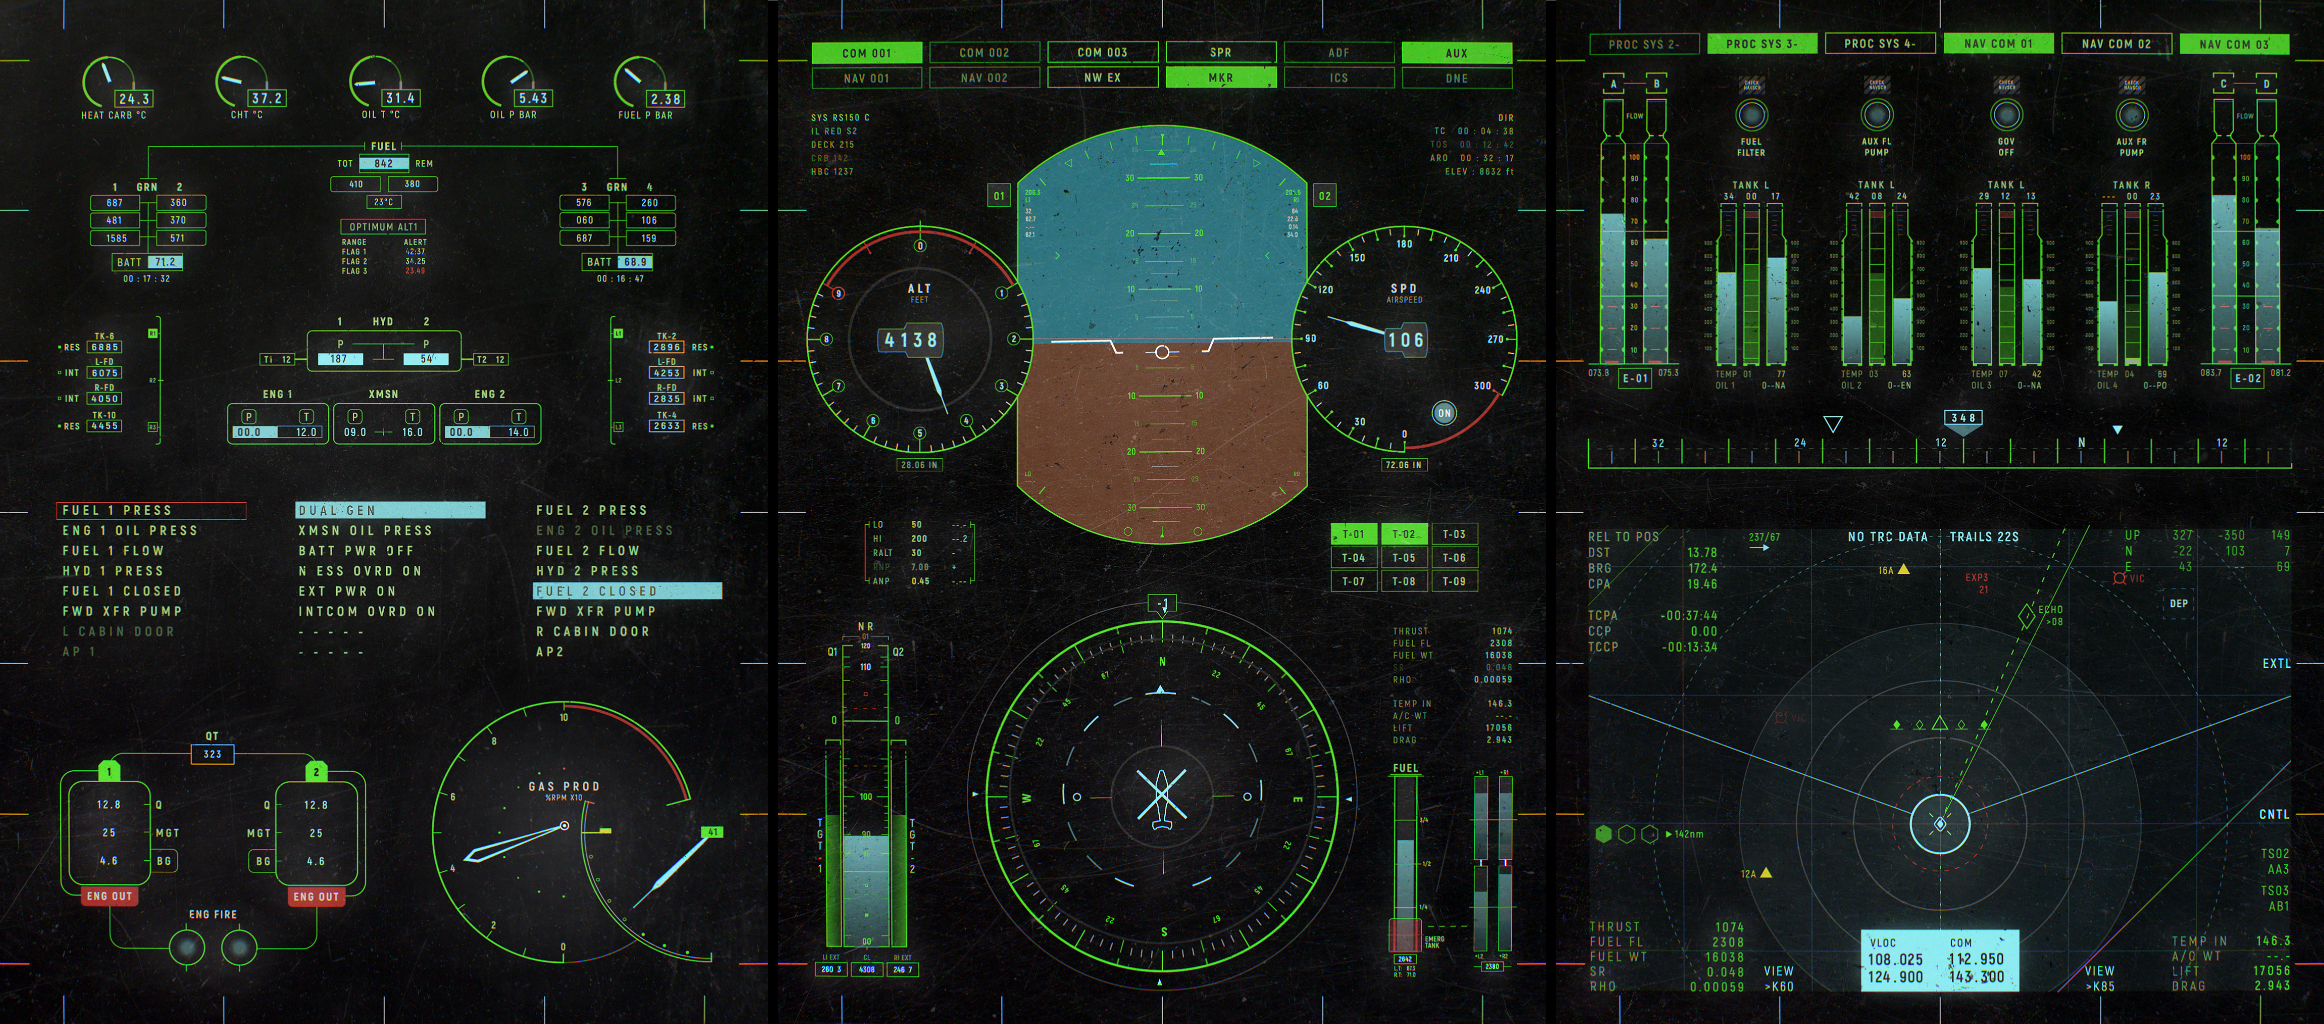 aa_heli_cockpit_coltreat_003.jpg